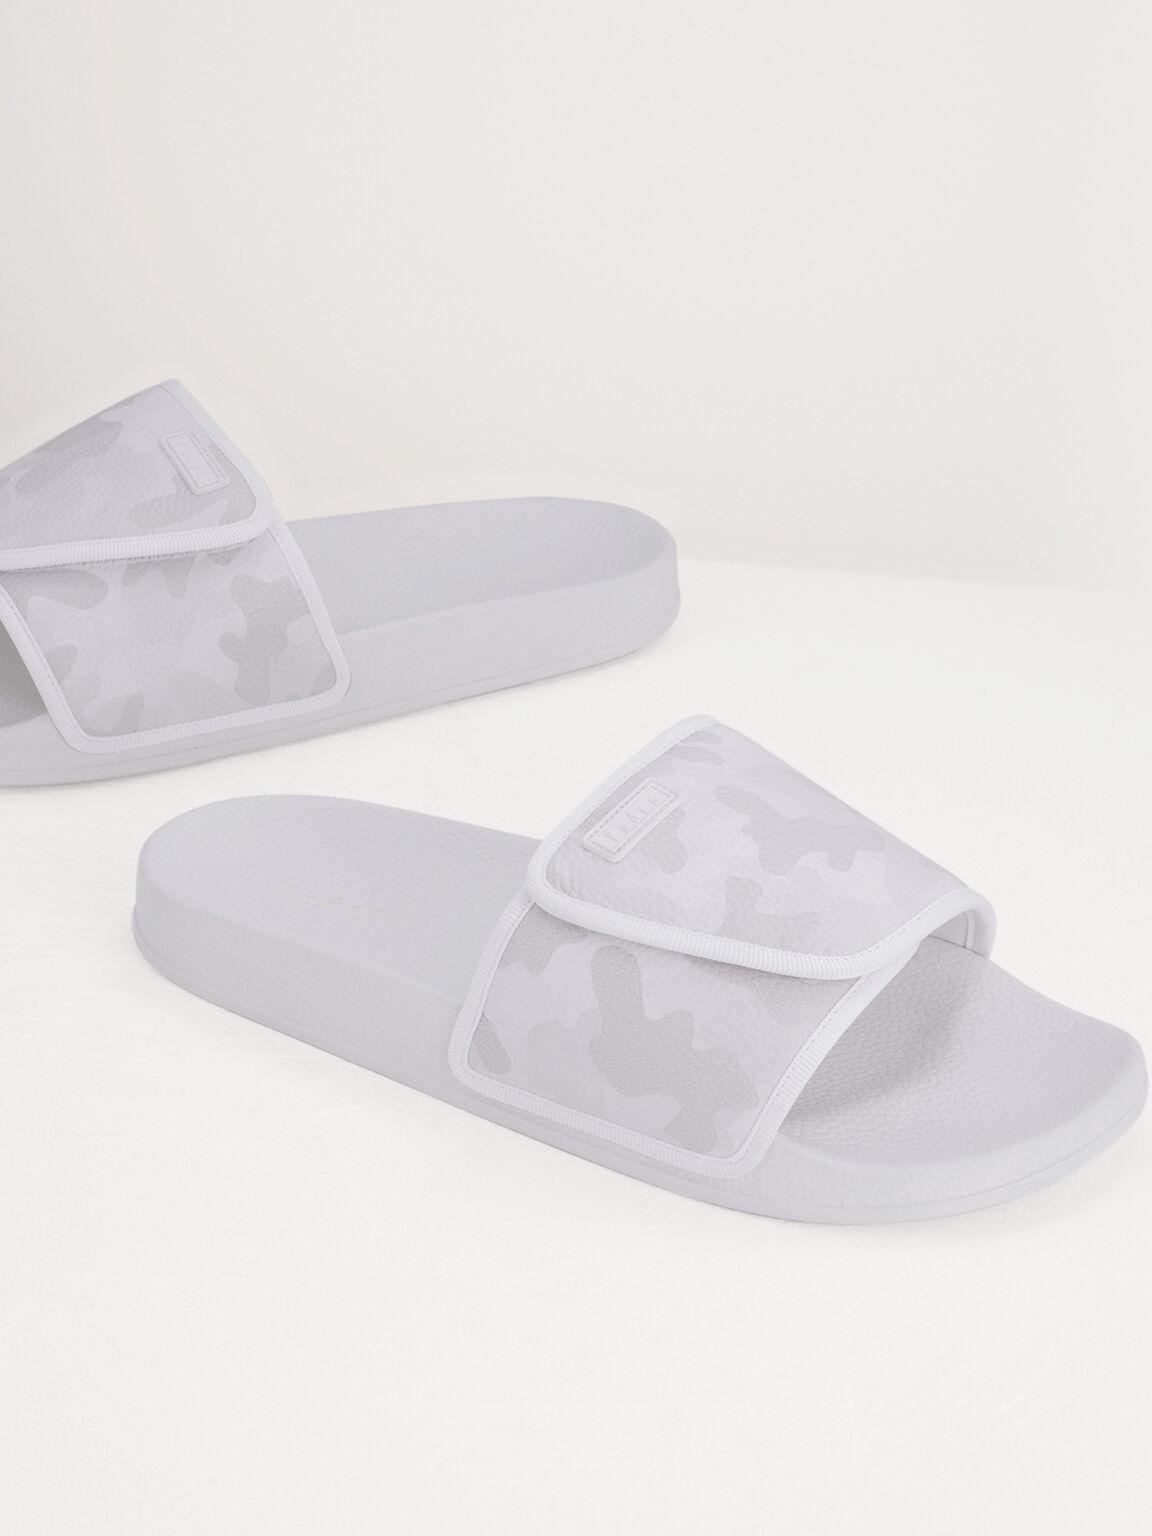 Camo-Effect Sliders, White, hi-res